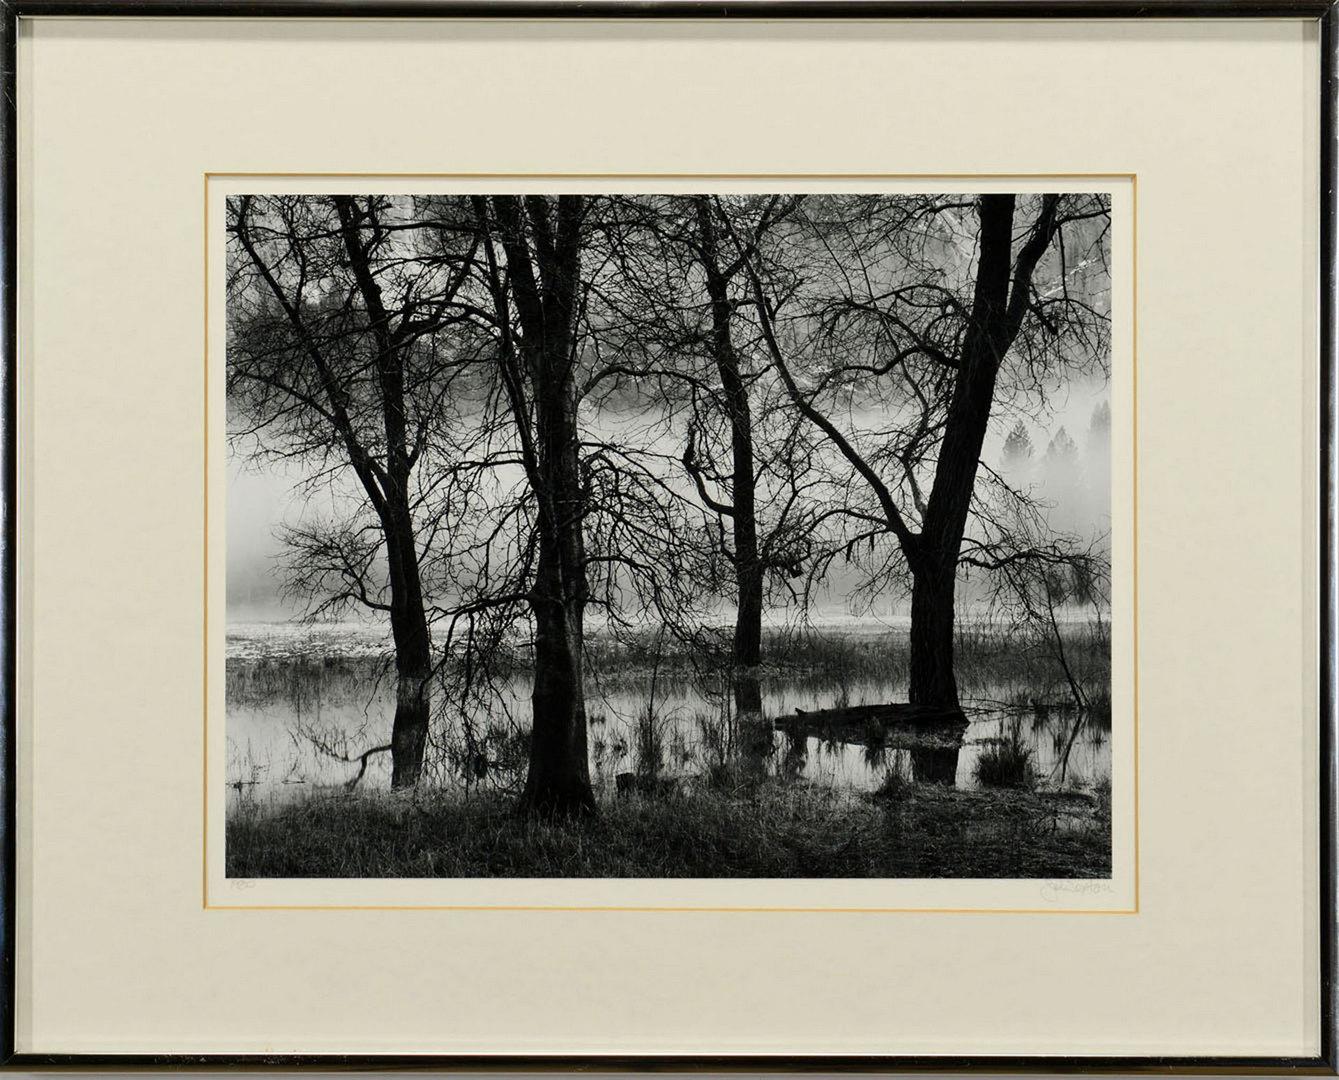 Lot 367: John Sexton Landscape Gelatin Silver Print